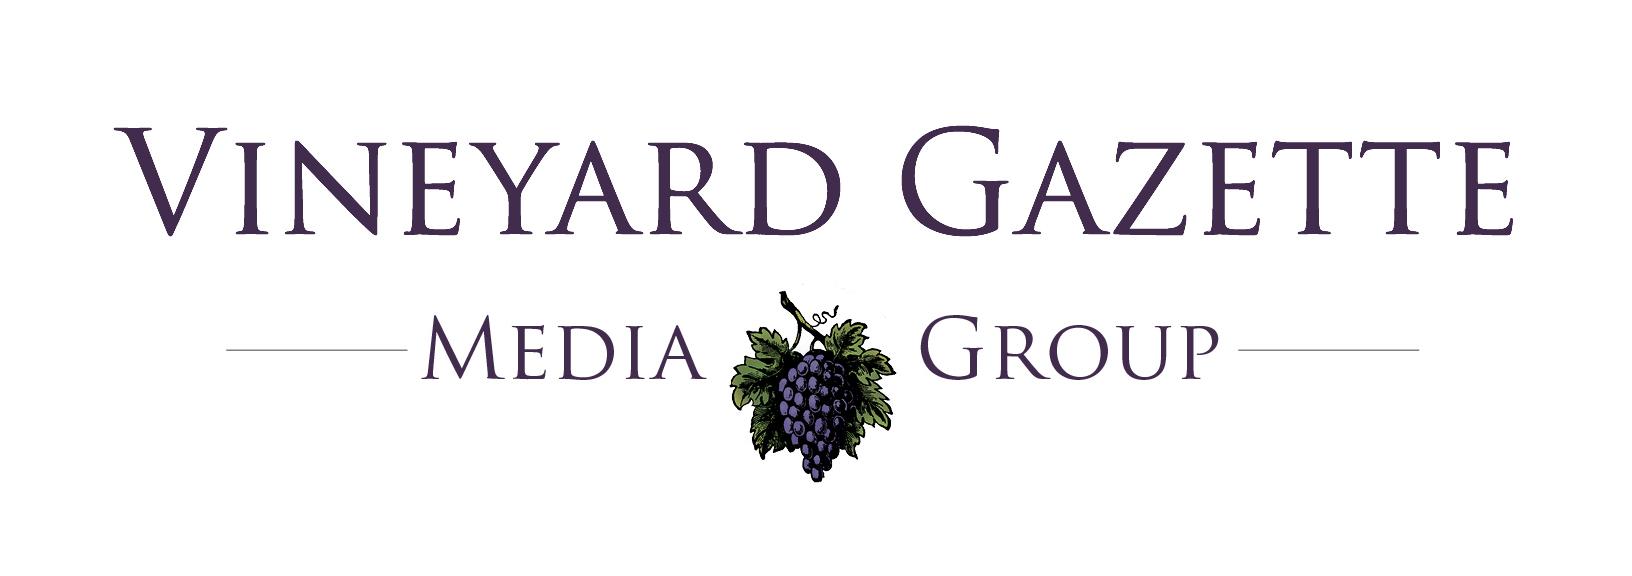 VG Media Group logo COLOR.jpg